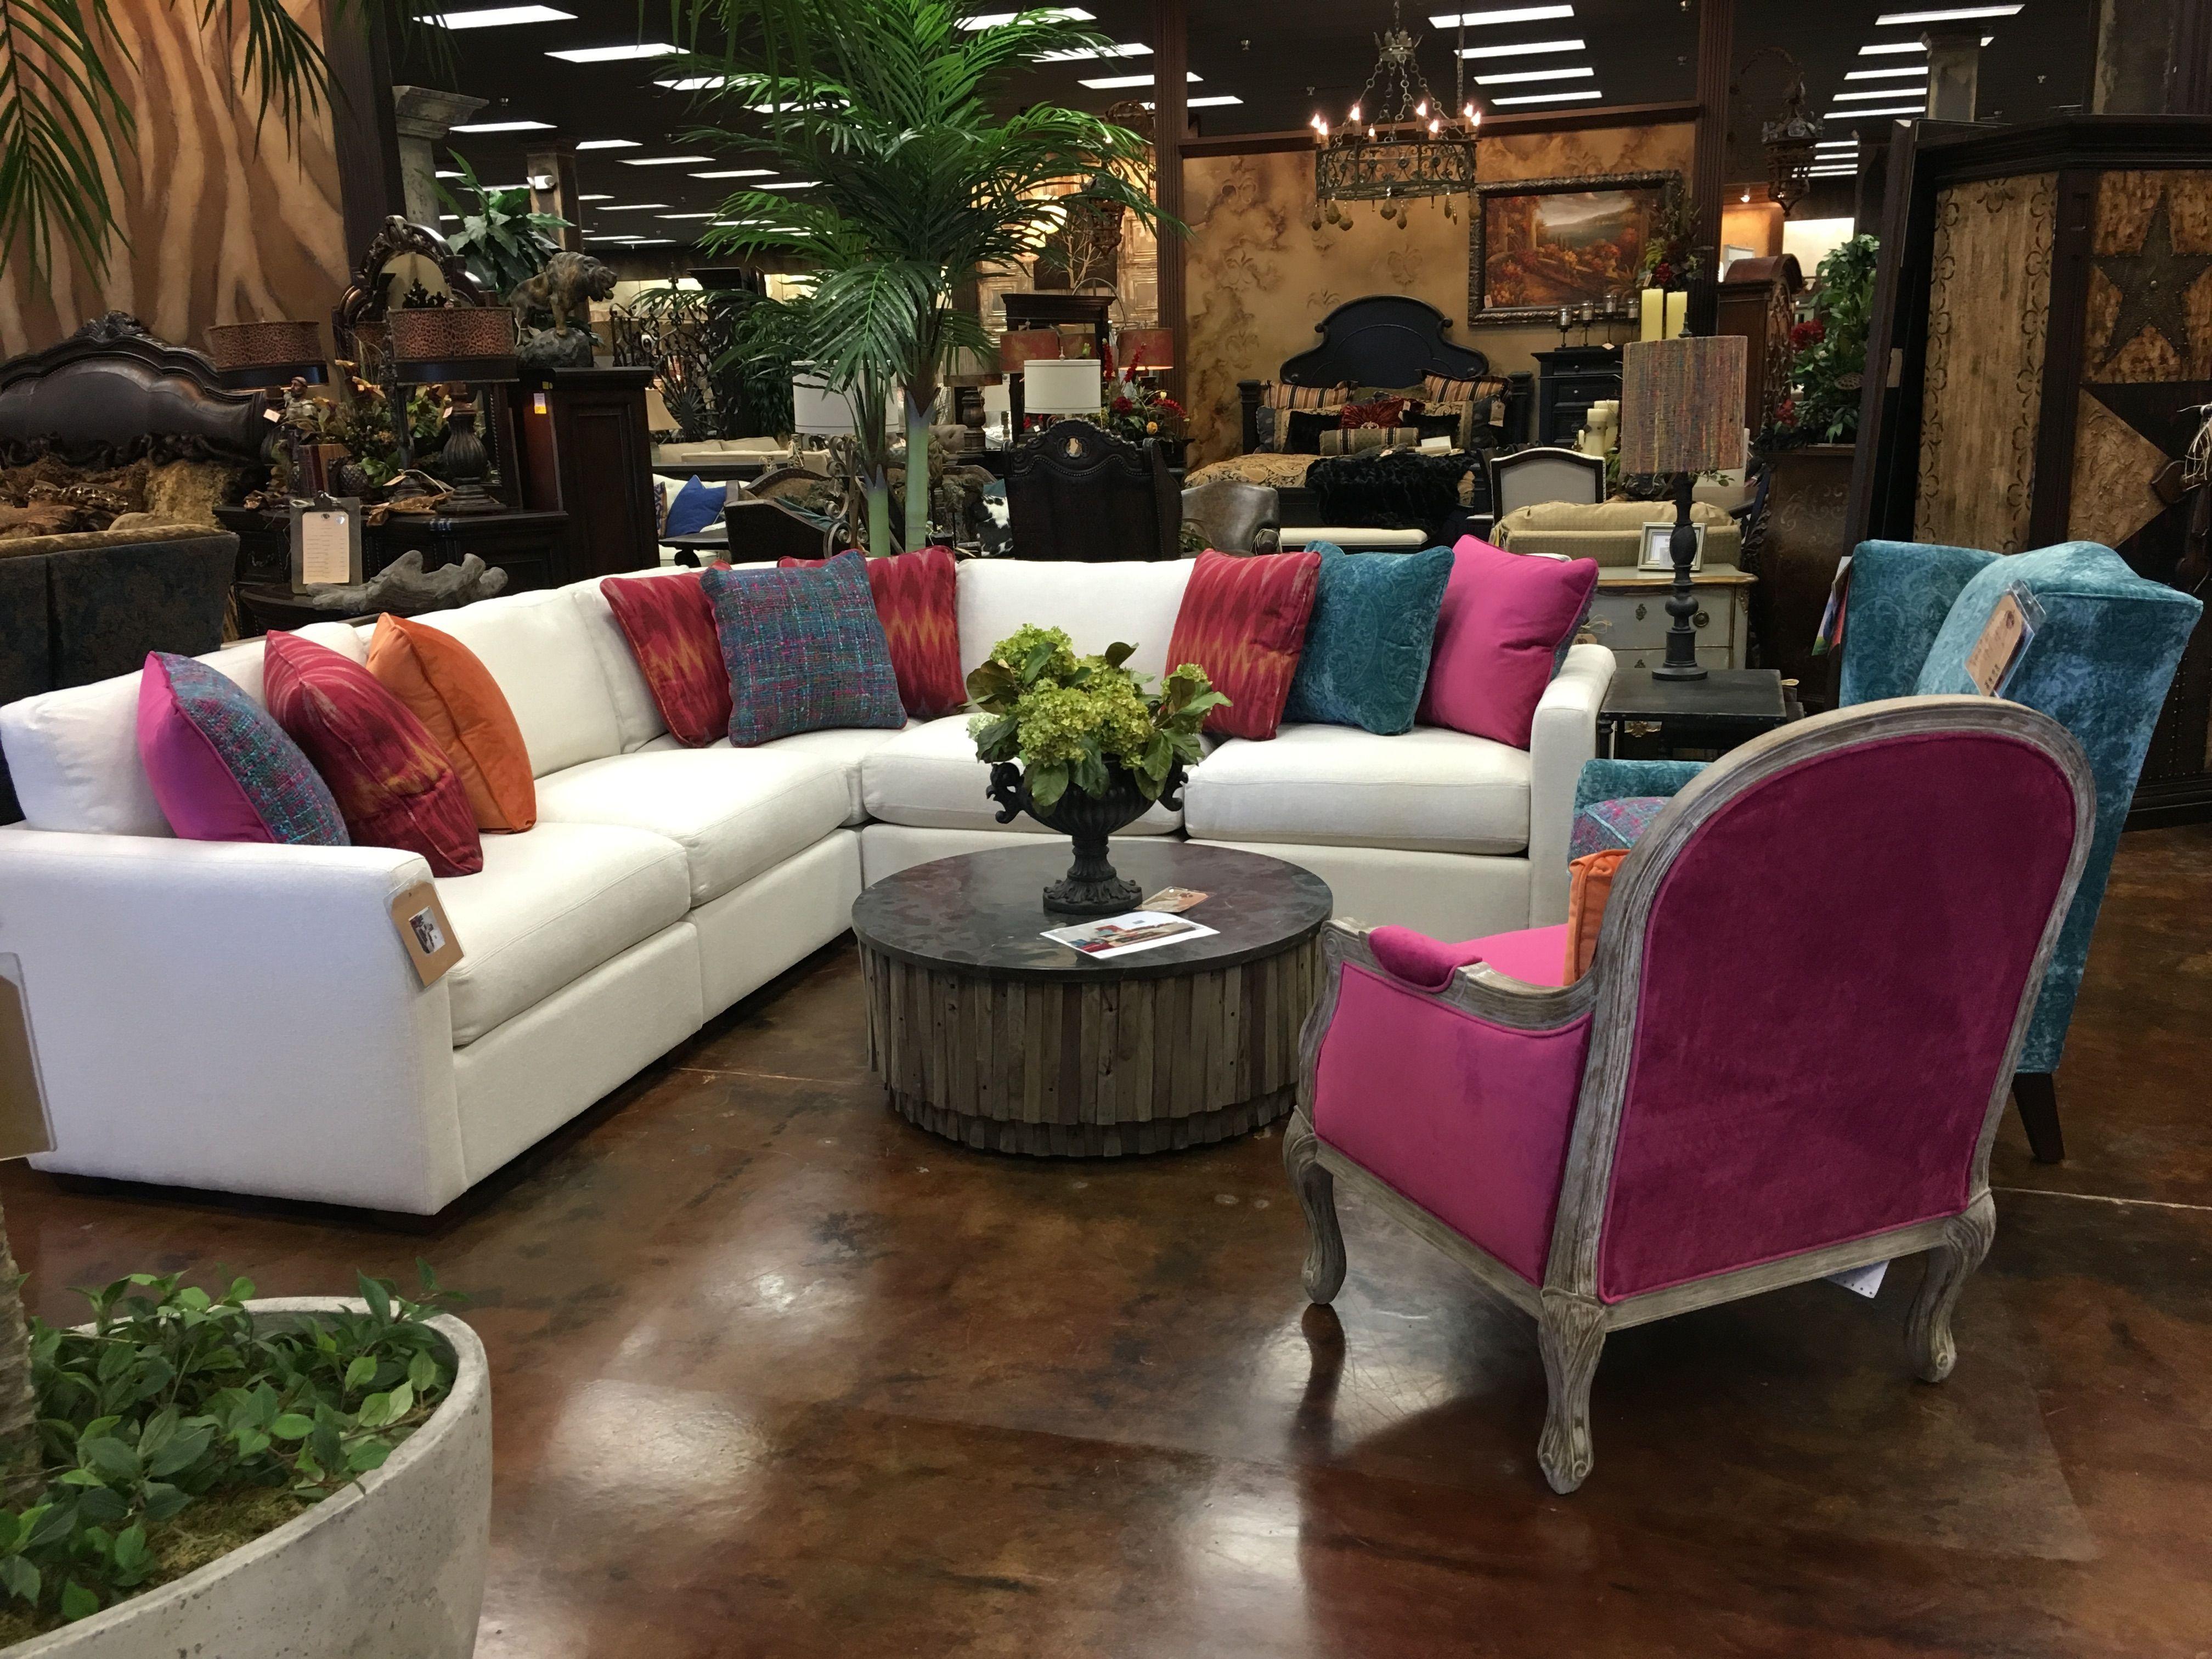 Nice Available At Carteru0027s Furniture Midland TX 432.682.2843  Www.cartersfurnituremidland.com